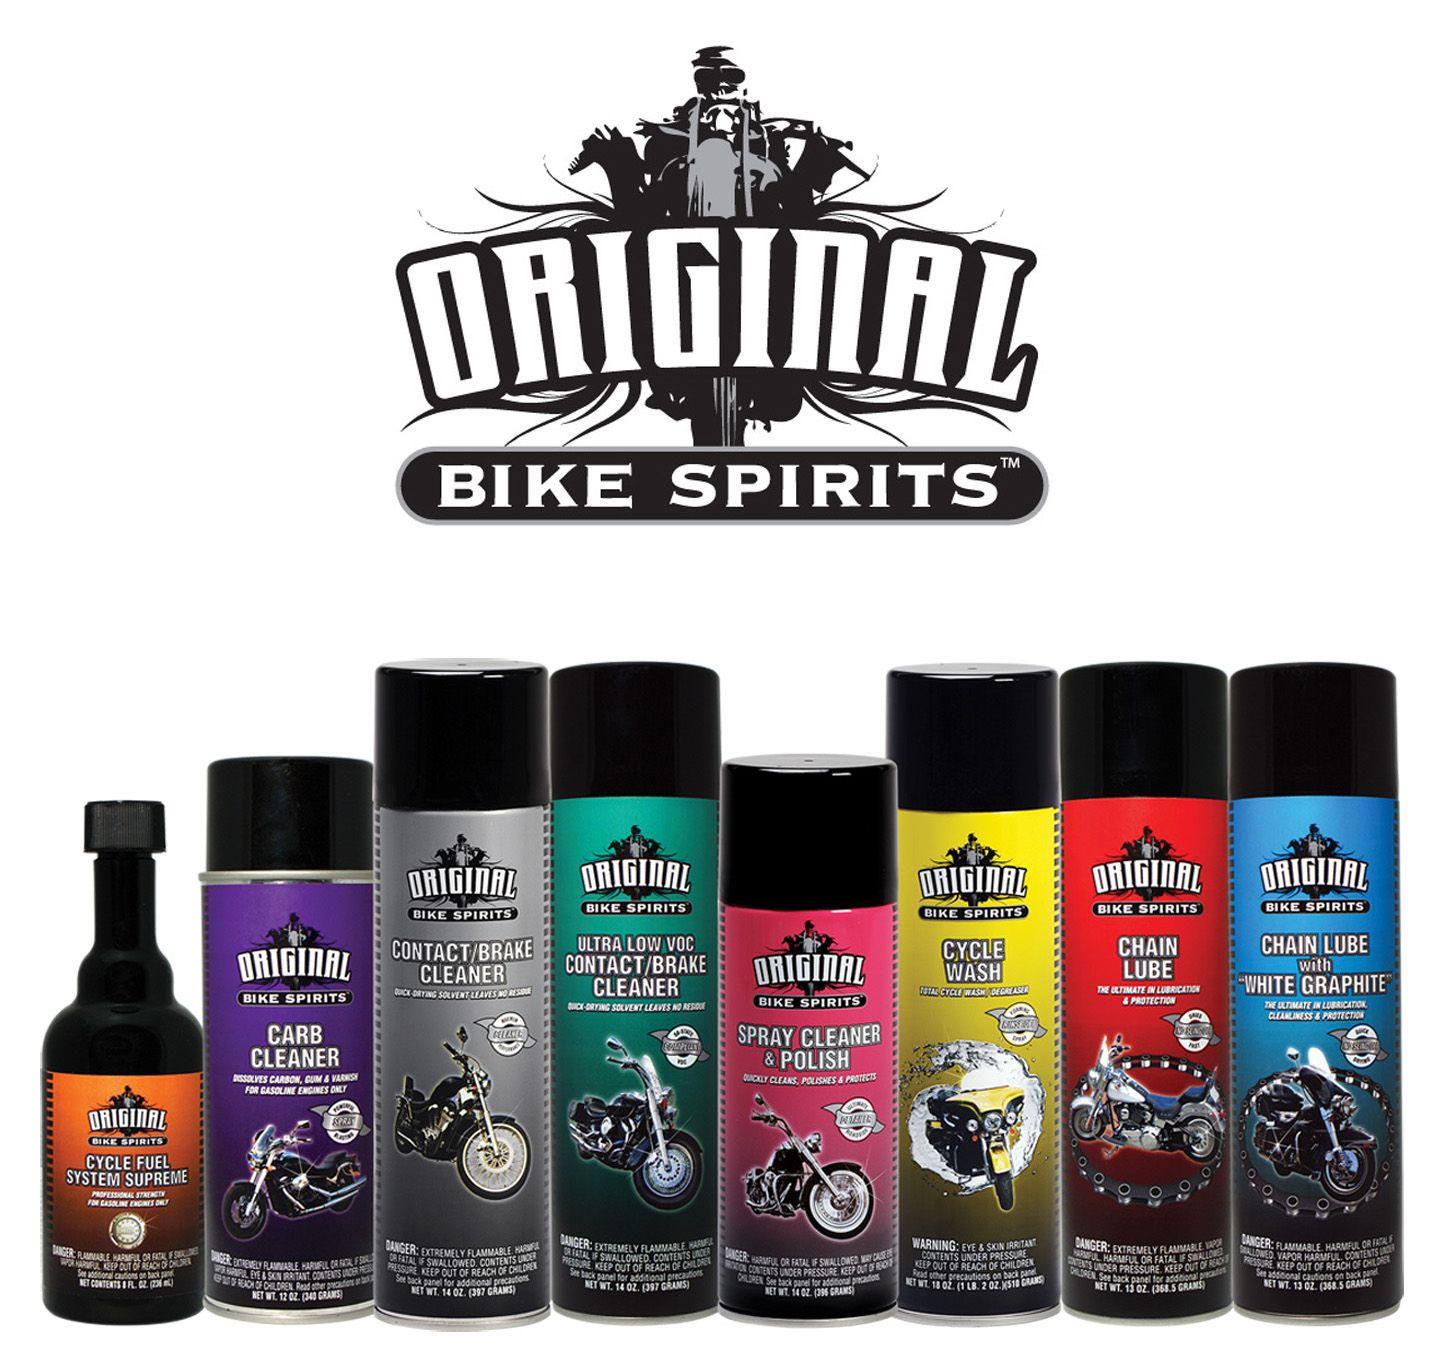 Original Bike Spirits by Zep Inc. Announces Western Power